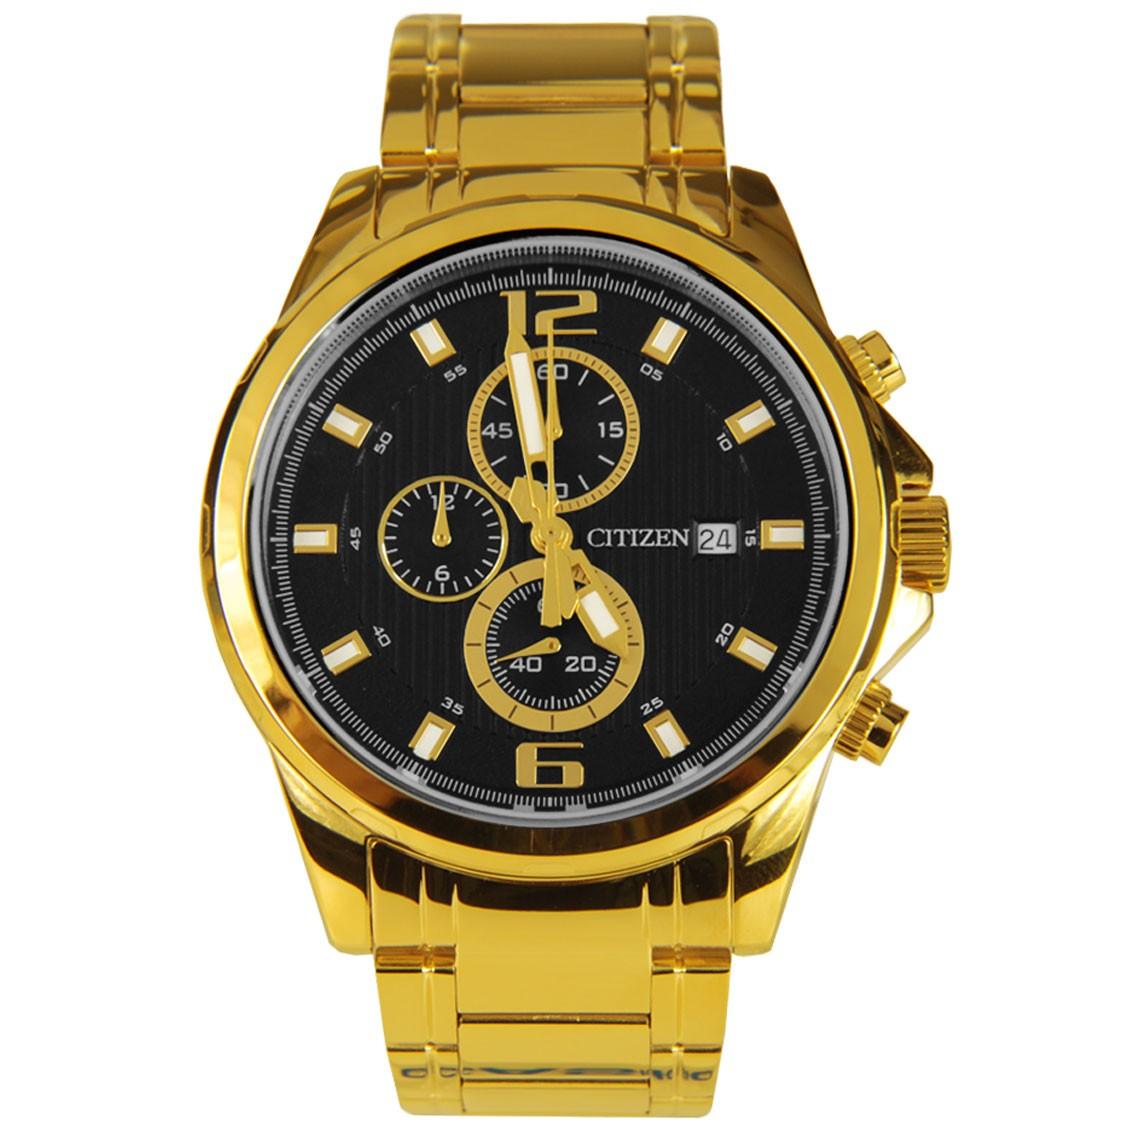 Citizen Chronograph Men's Watch รุ่น AN3552-50E